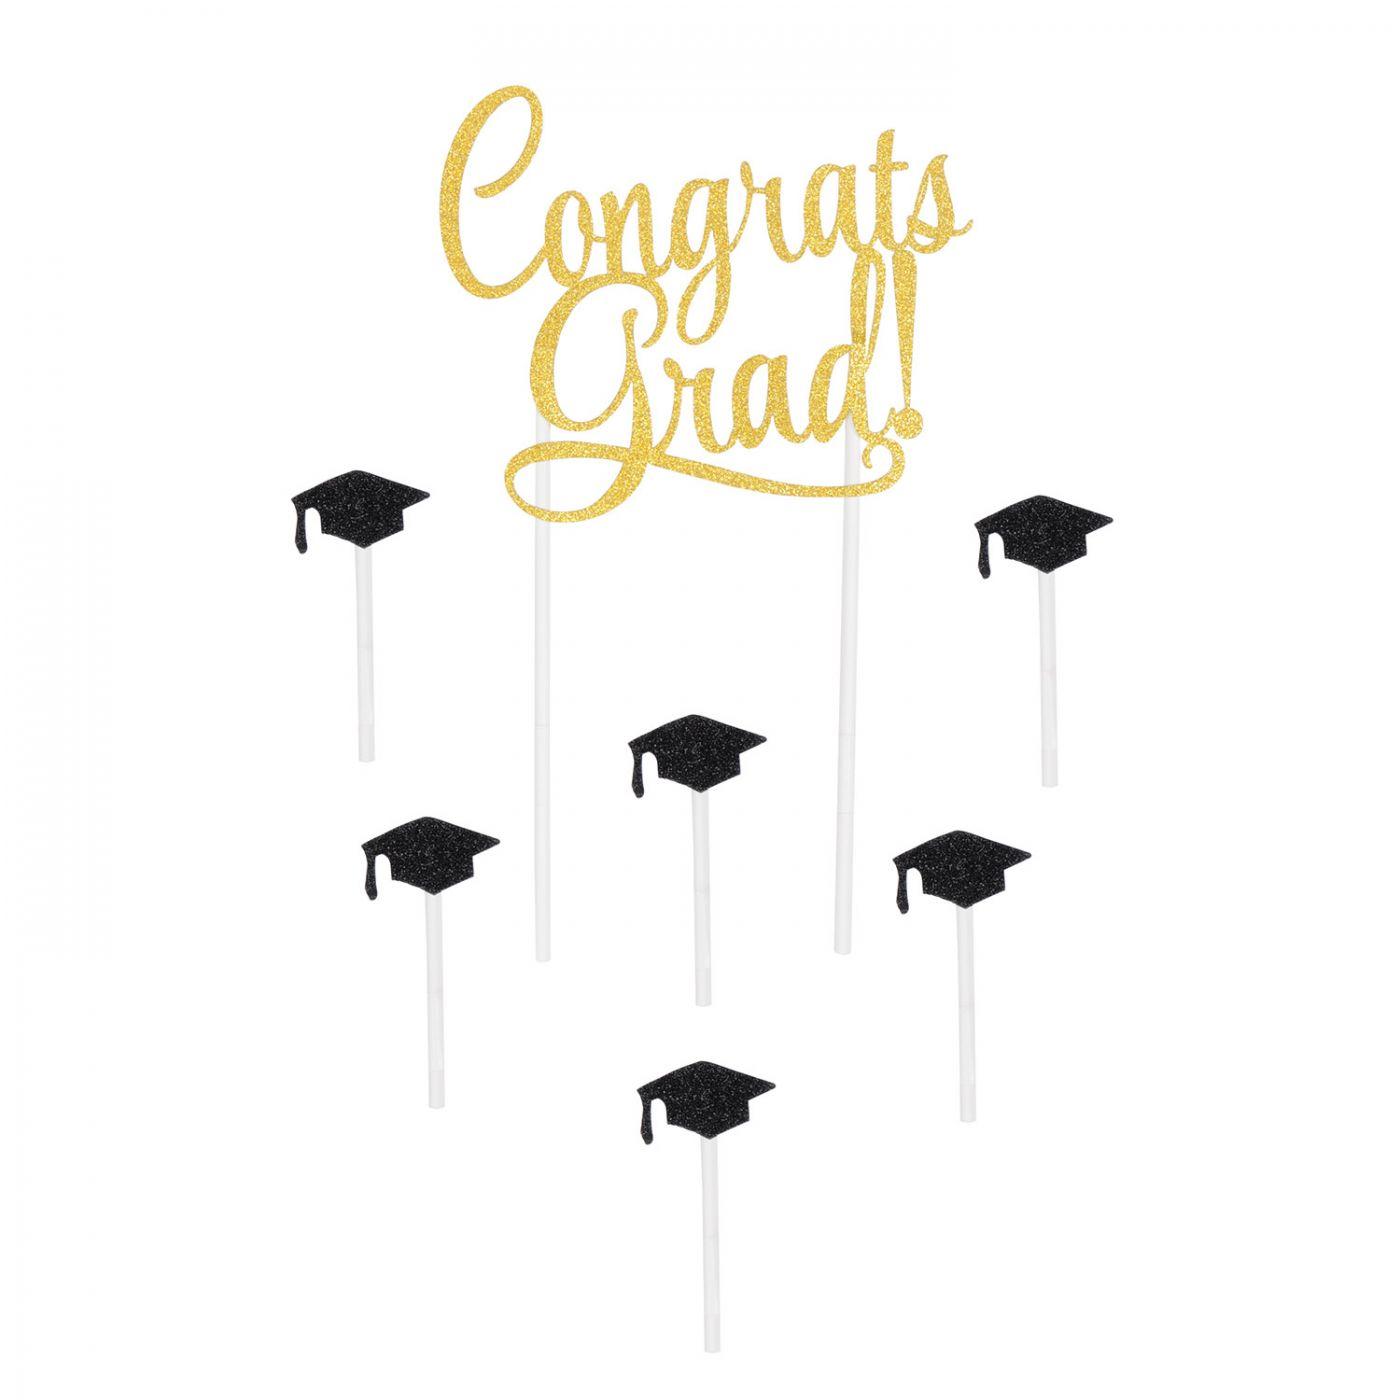 Congrats Grad! Cake Topper image